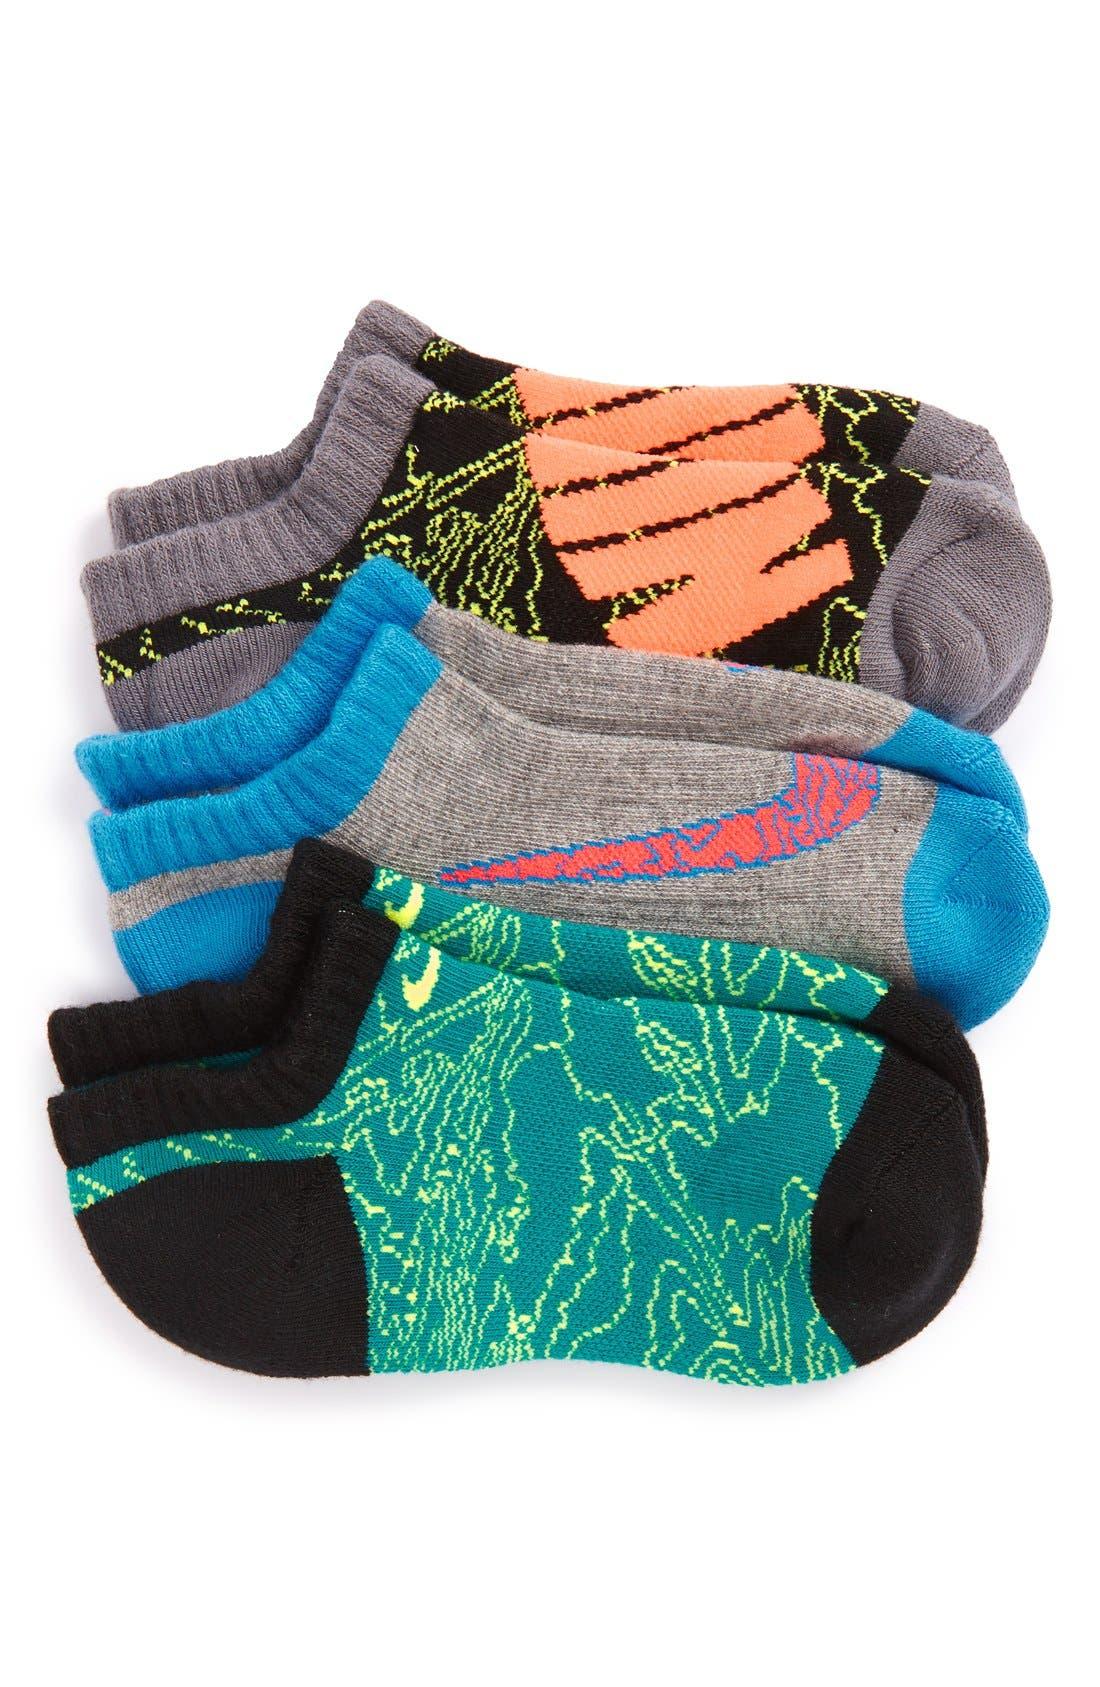 Alternate Image 1 Selected - Nike Performance 3-Pack No-Show Socks (Walker, Toddler, Little Kid & Big Kid)